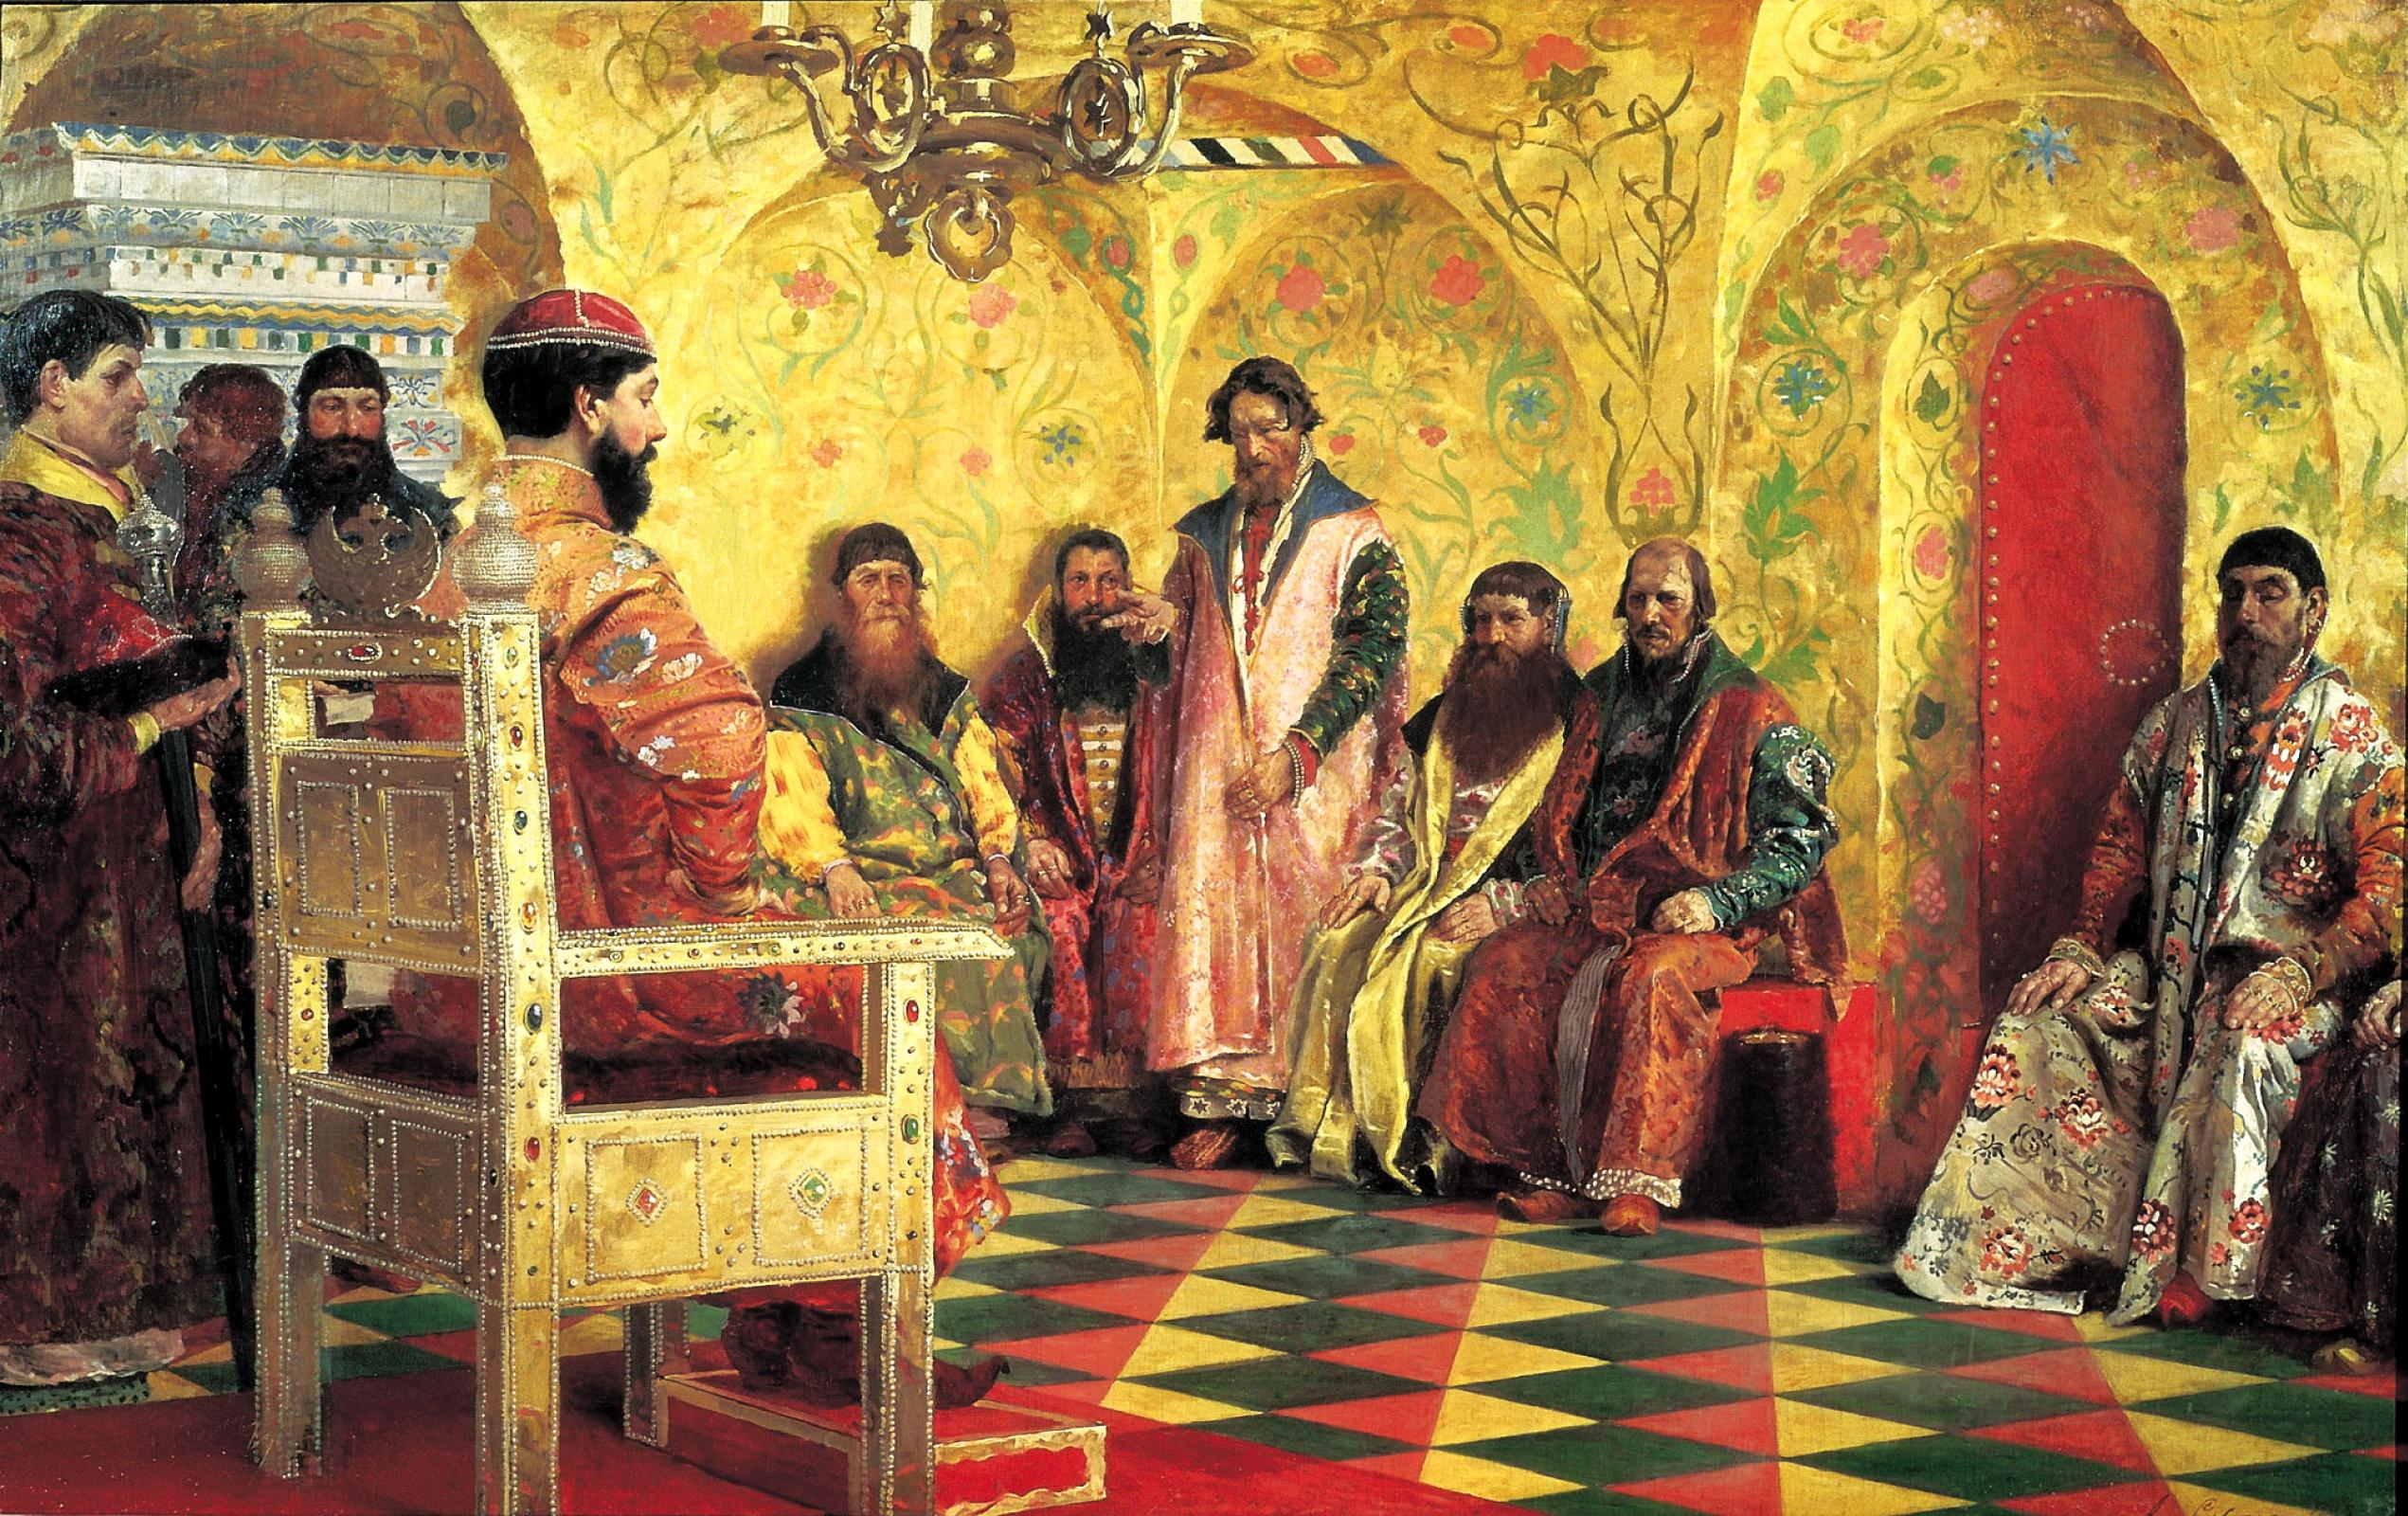 https://i2.wp.com/upload.wikimedia.org/wikipedia/commons/b/b8/Tsar_boyar_duma.jpg